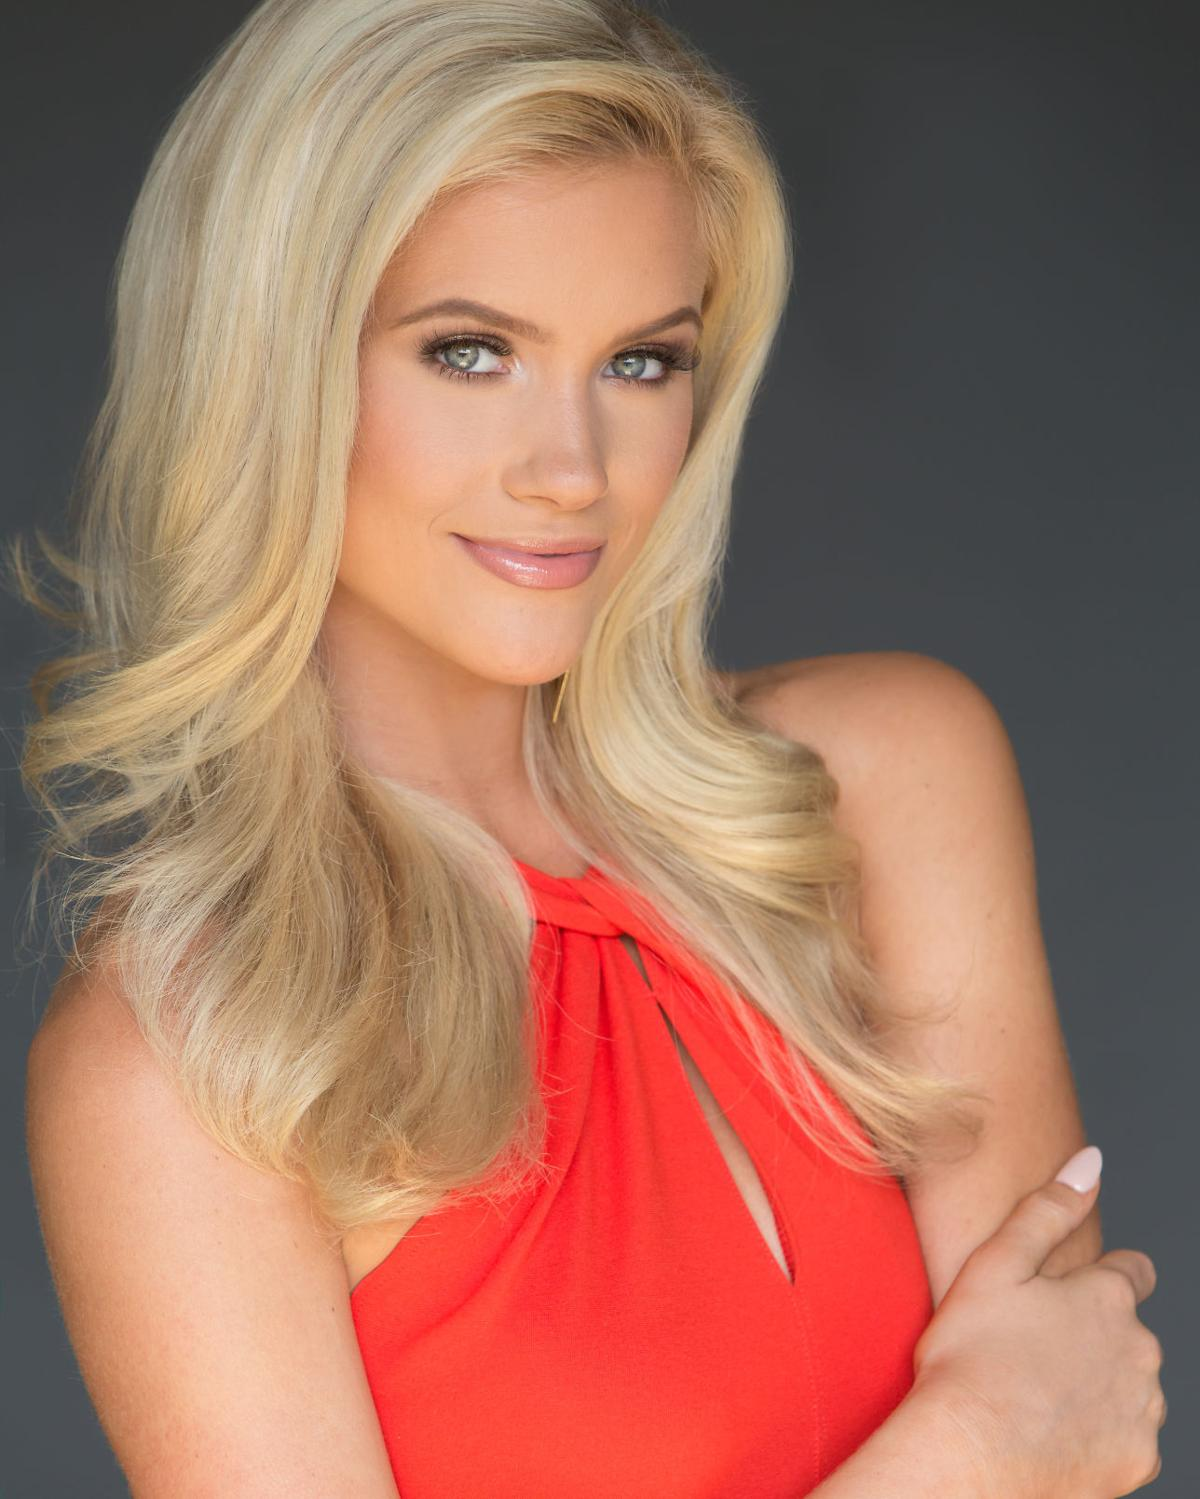 Miss Maryland 2017 Kathleen Masek